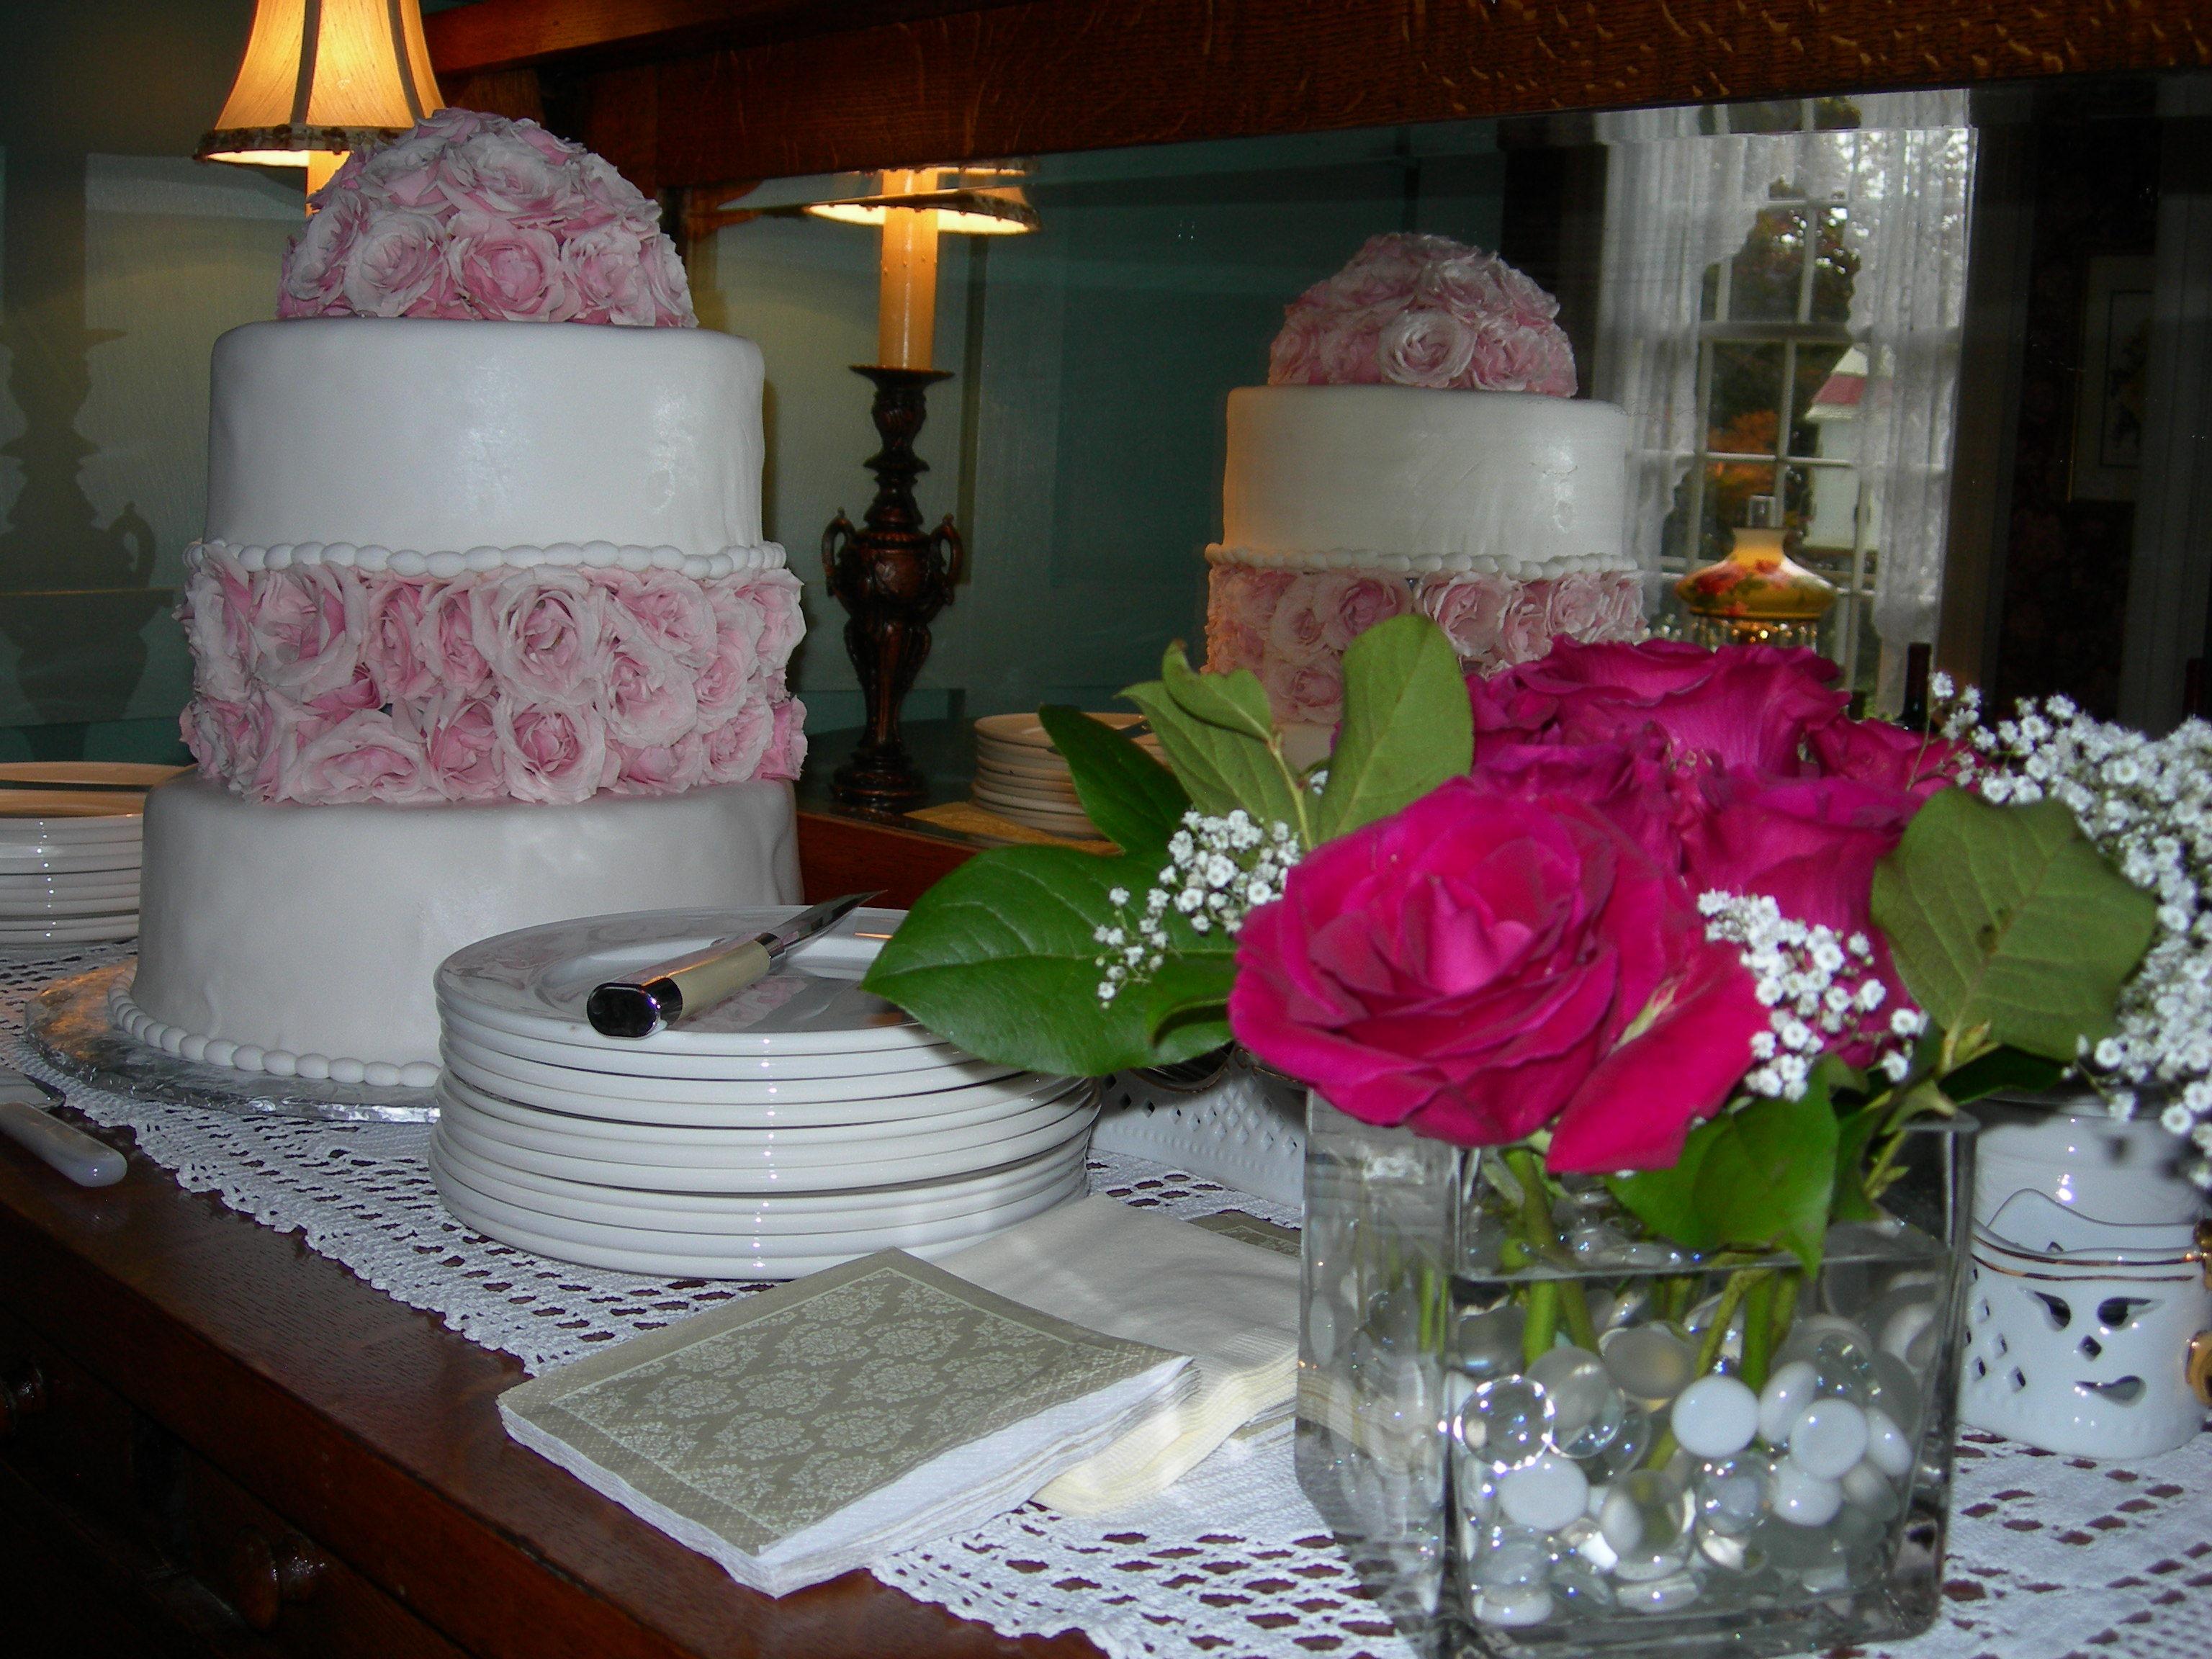 Cakes, Registry, cake, Bed, Bedding, And, Breakfast, Inn, Street, Manor, Main, Flowery